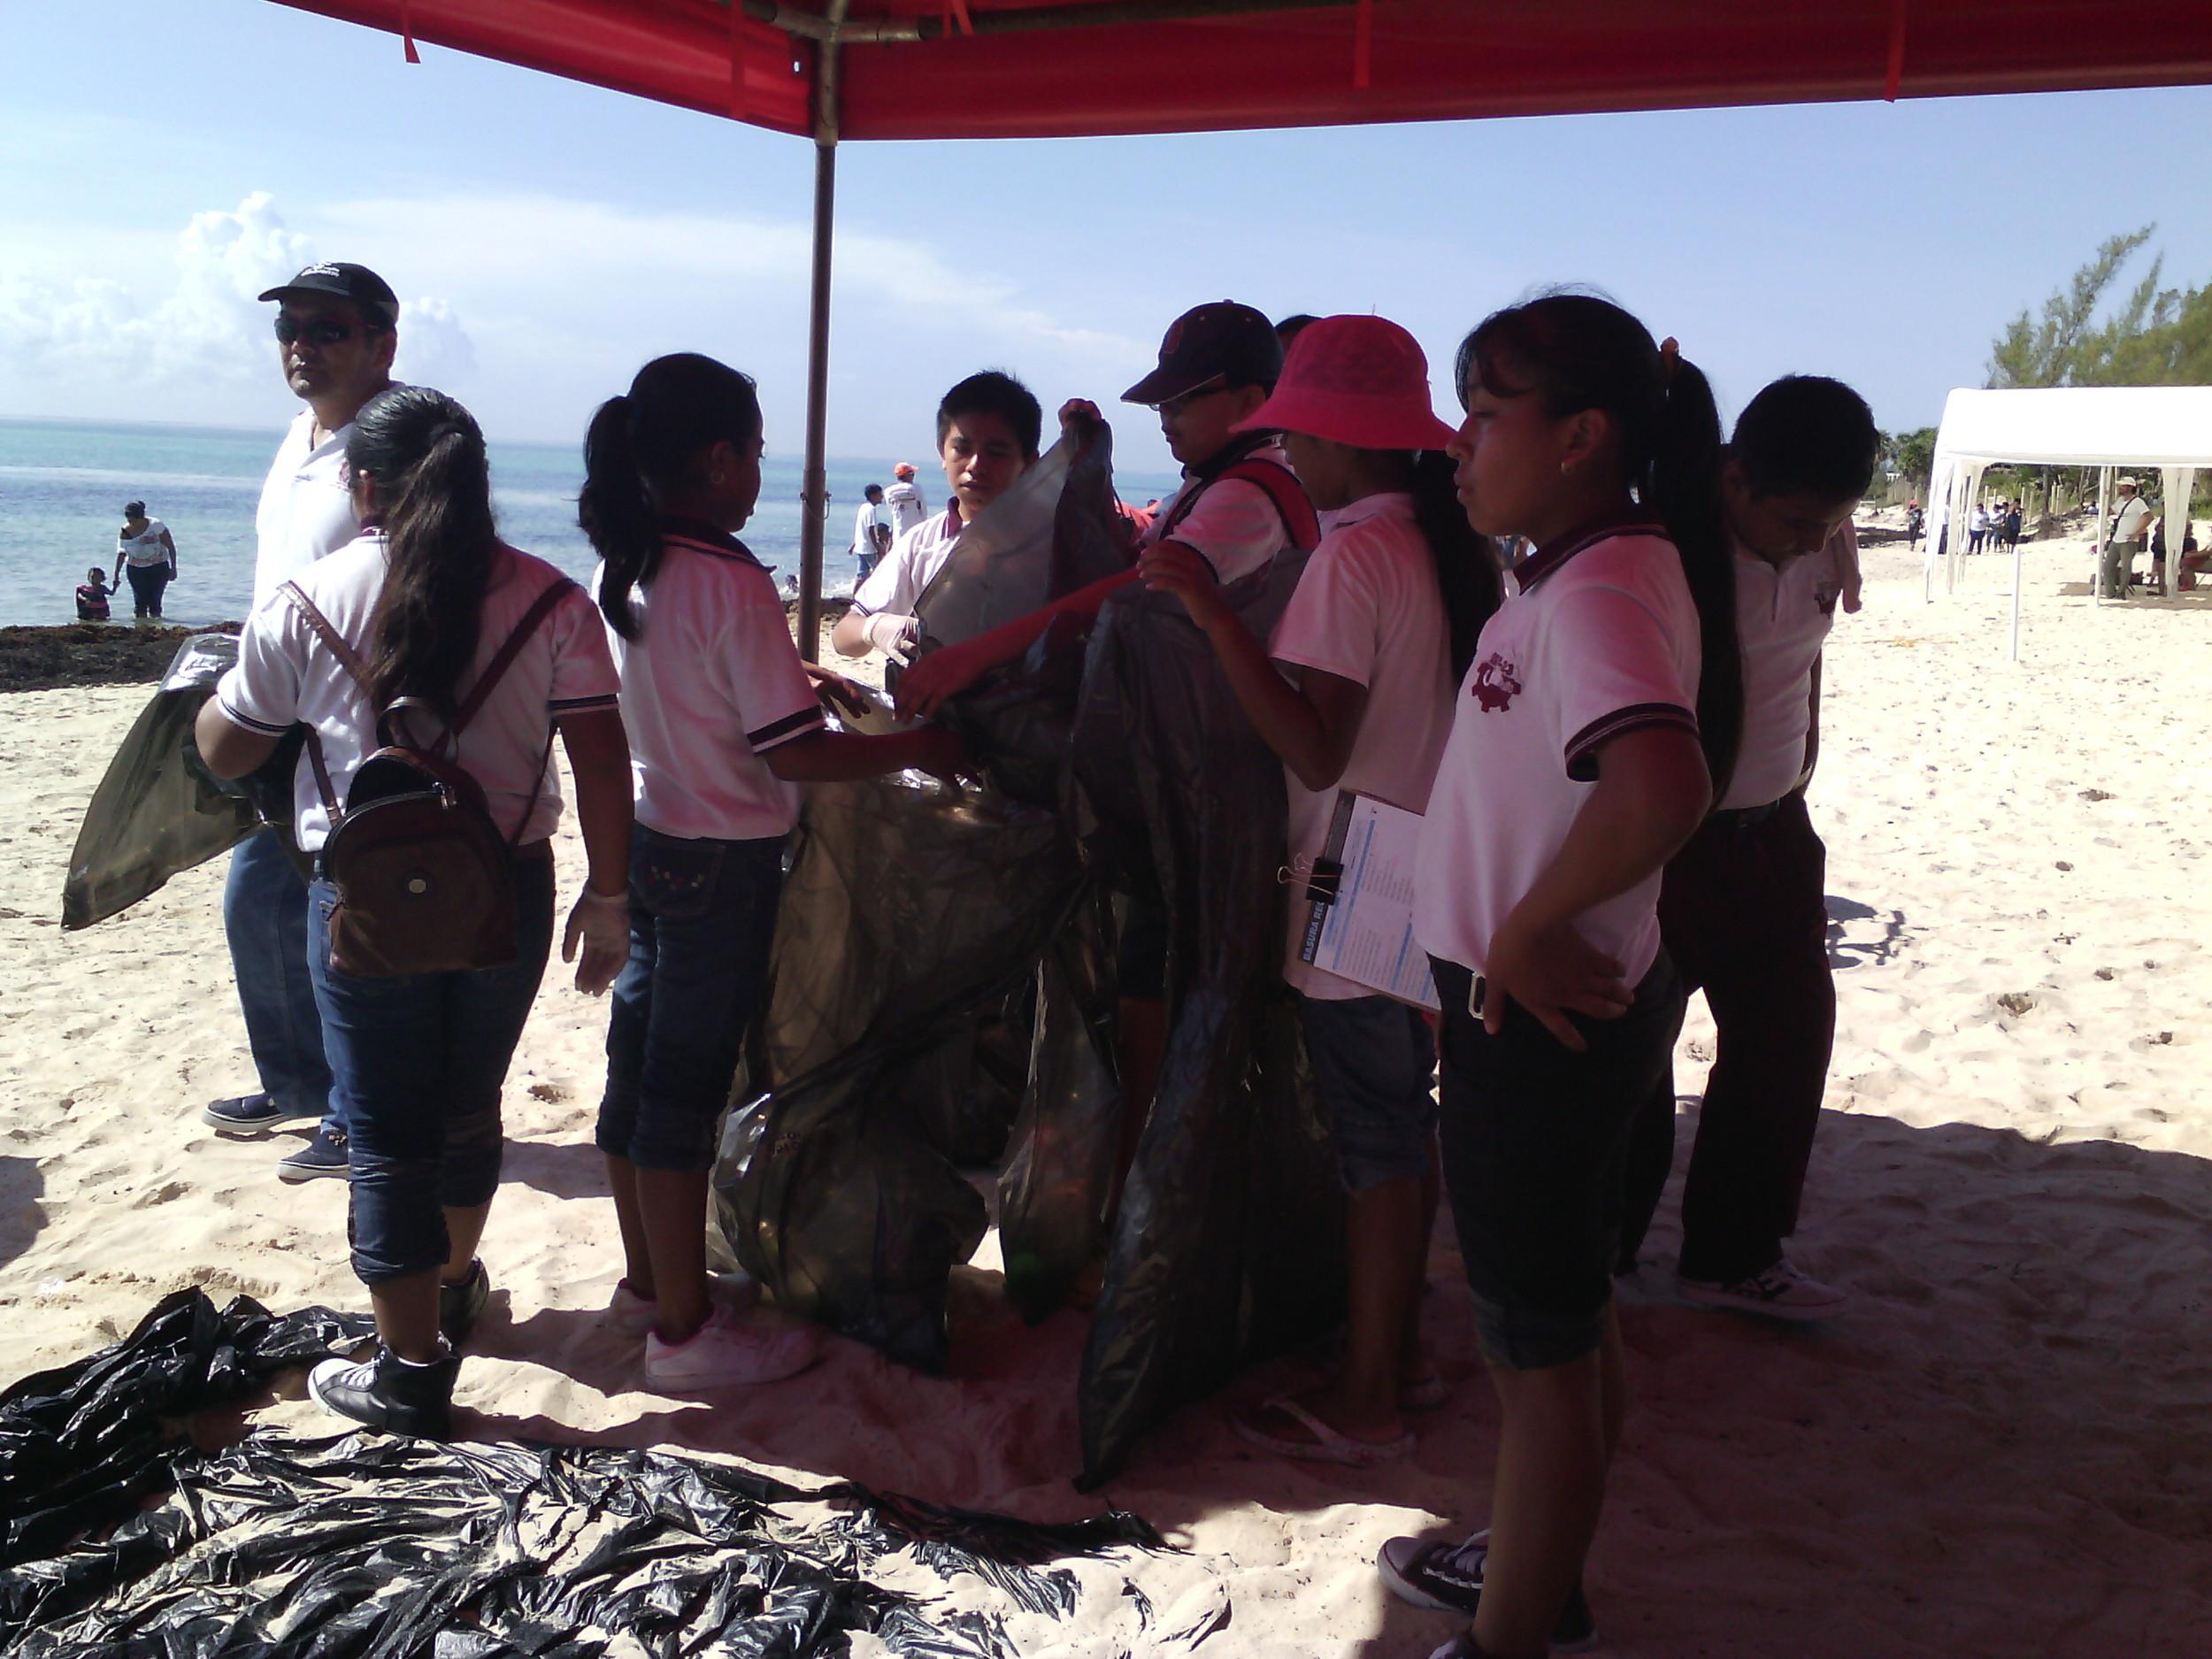 Mexico - Playa del Carmen - ICC2015 - 7.jpg